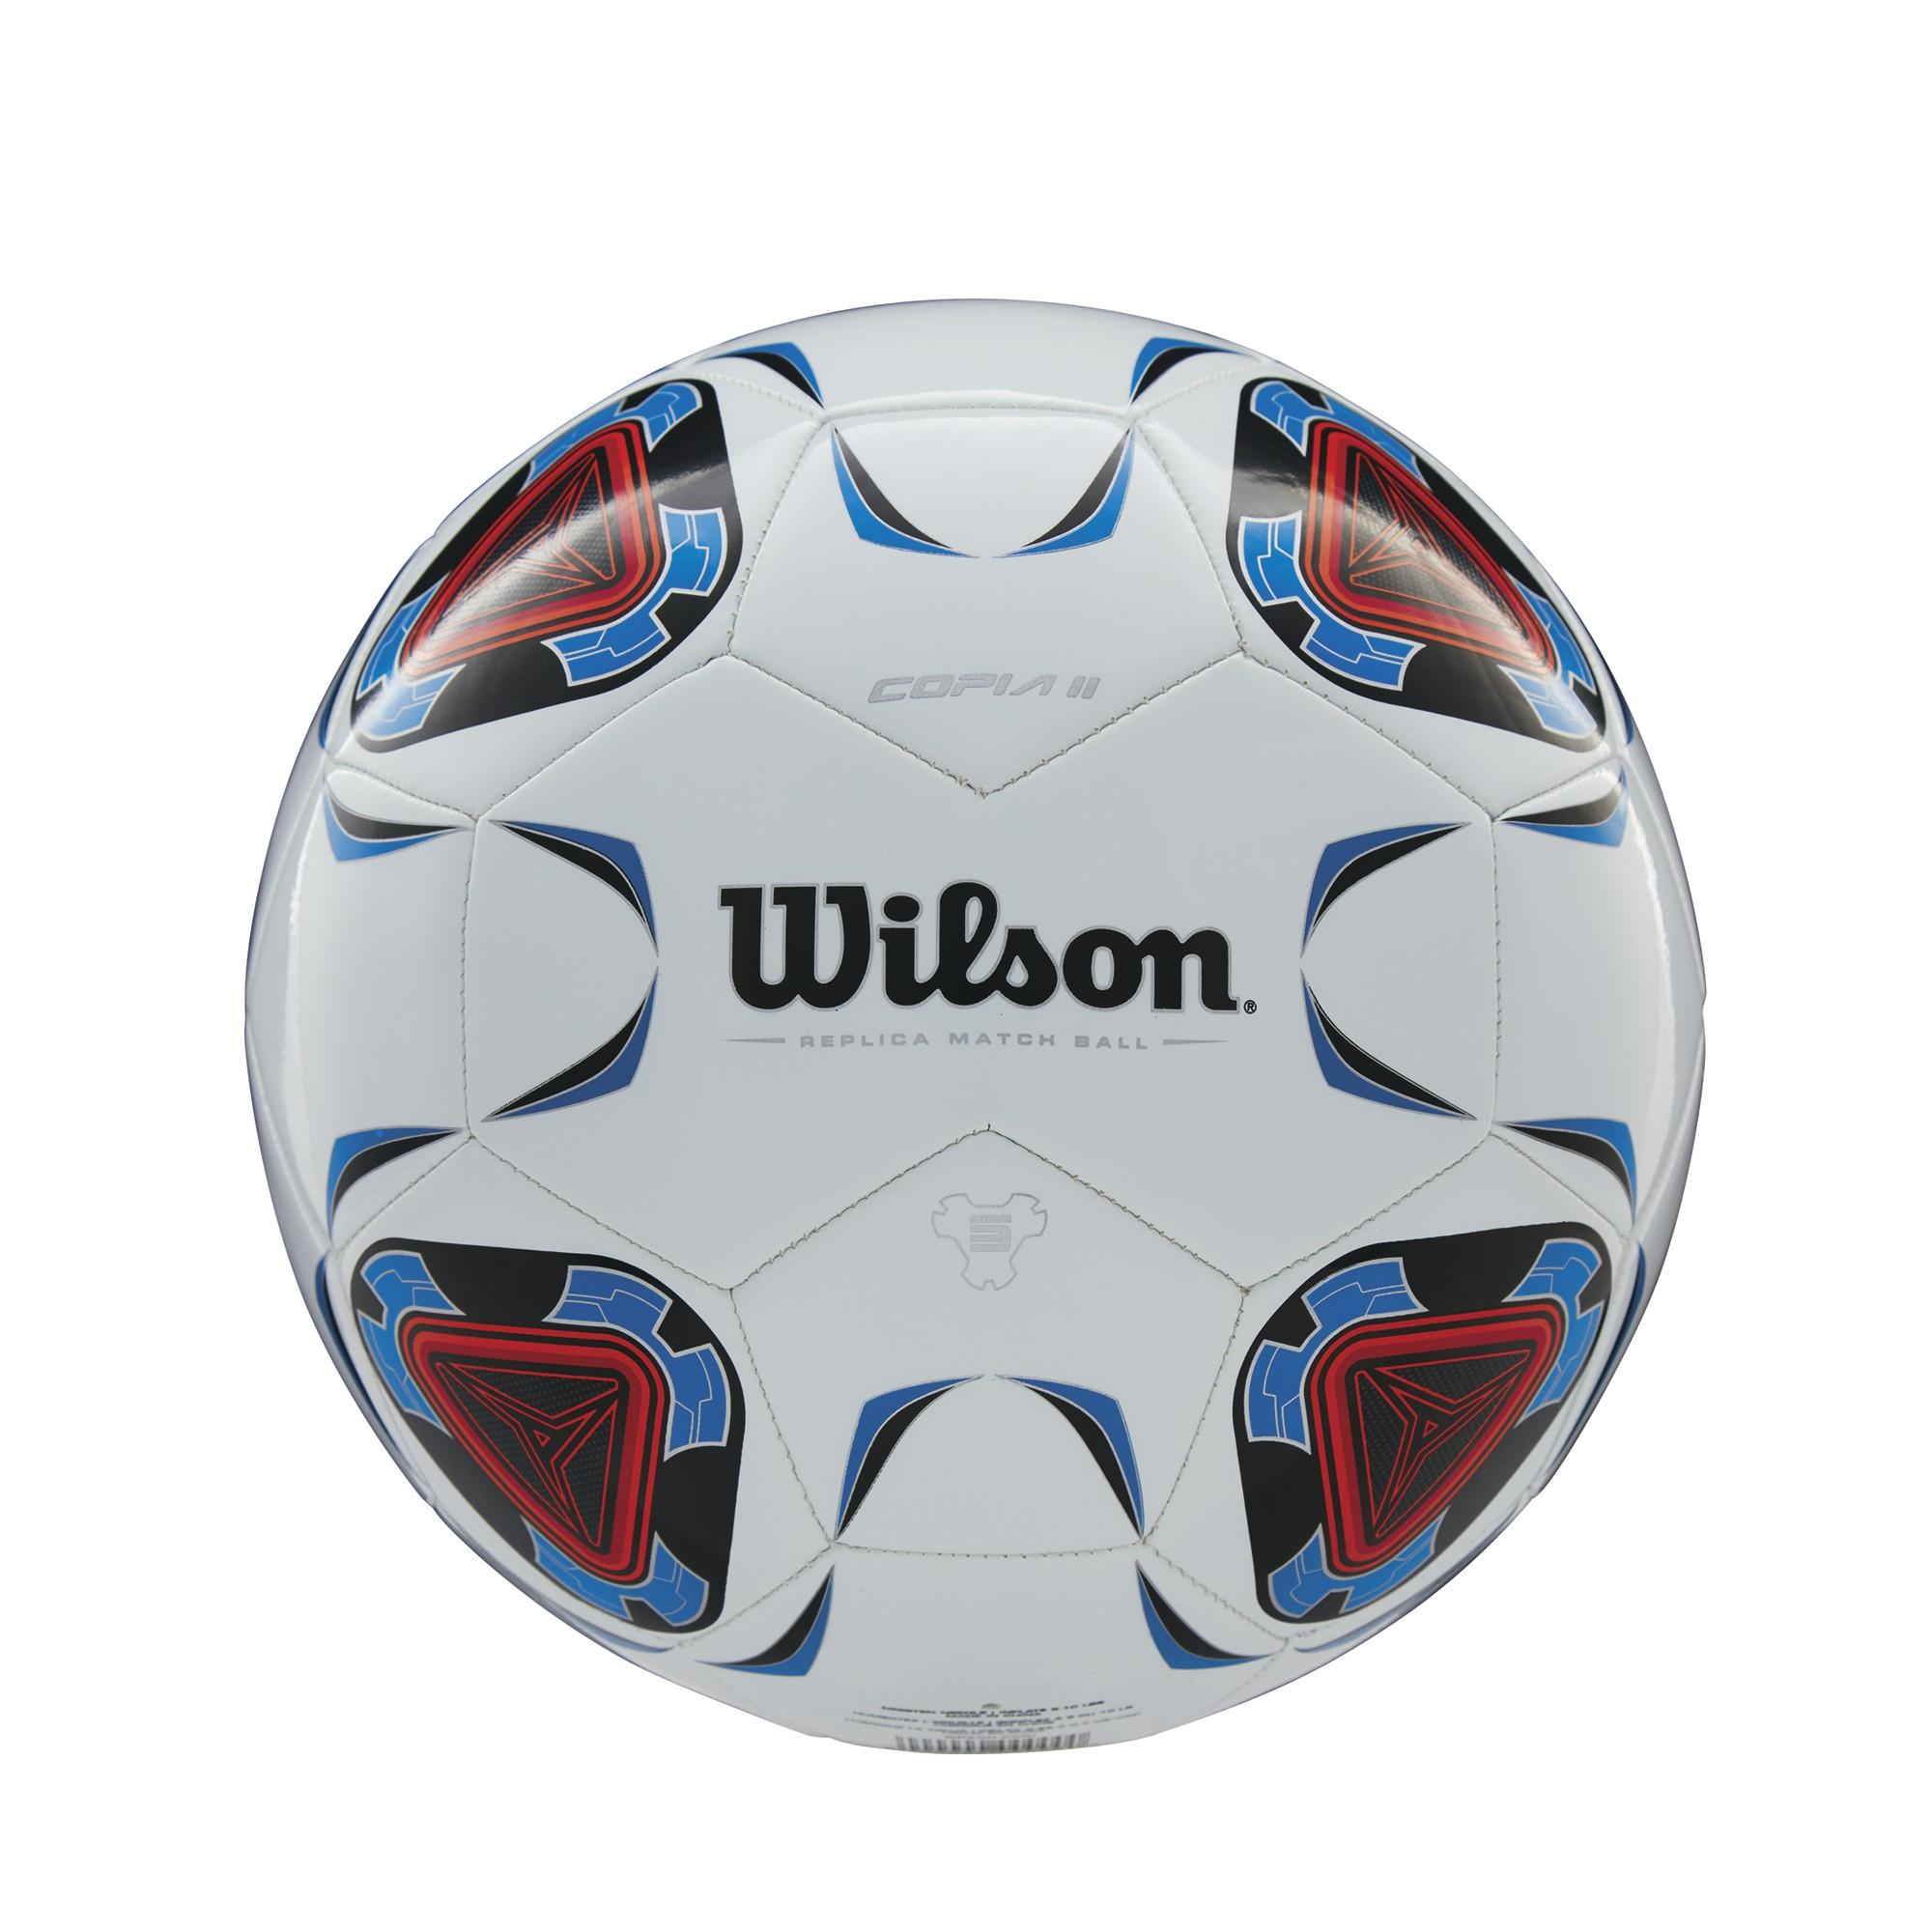 WILSON futbola bumba COPIA II SZ4 bumba